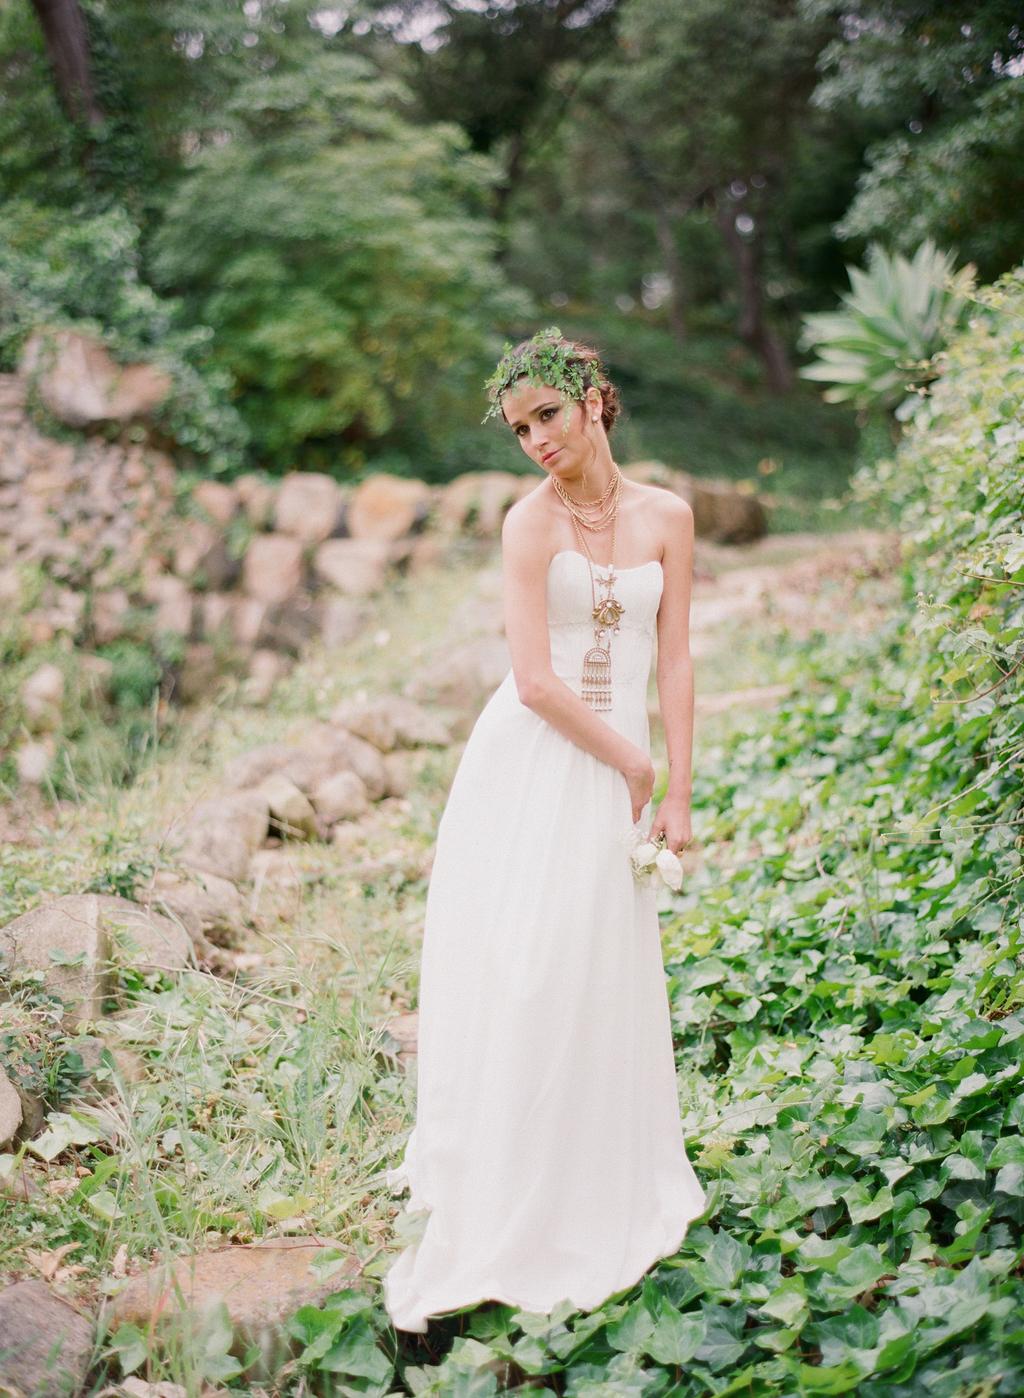 Styled-wedding-santa-barbara-chic-beaux-arts-photographie-italian-bohemian-wedding-bride-wedding-dress-white-flowers-bouquet-037.full